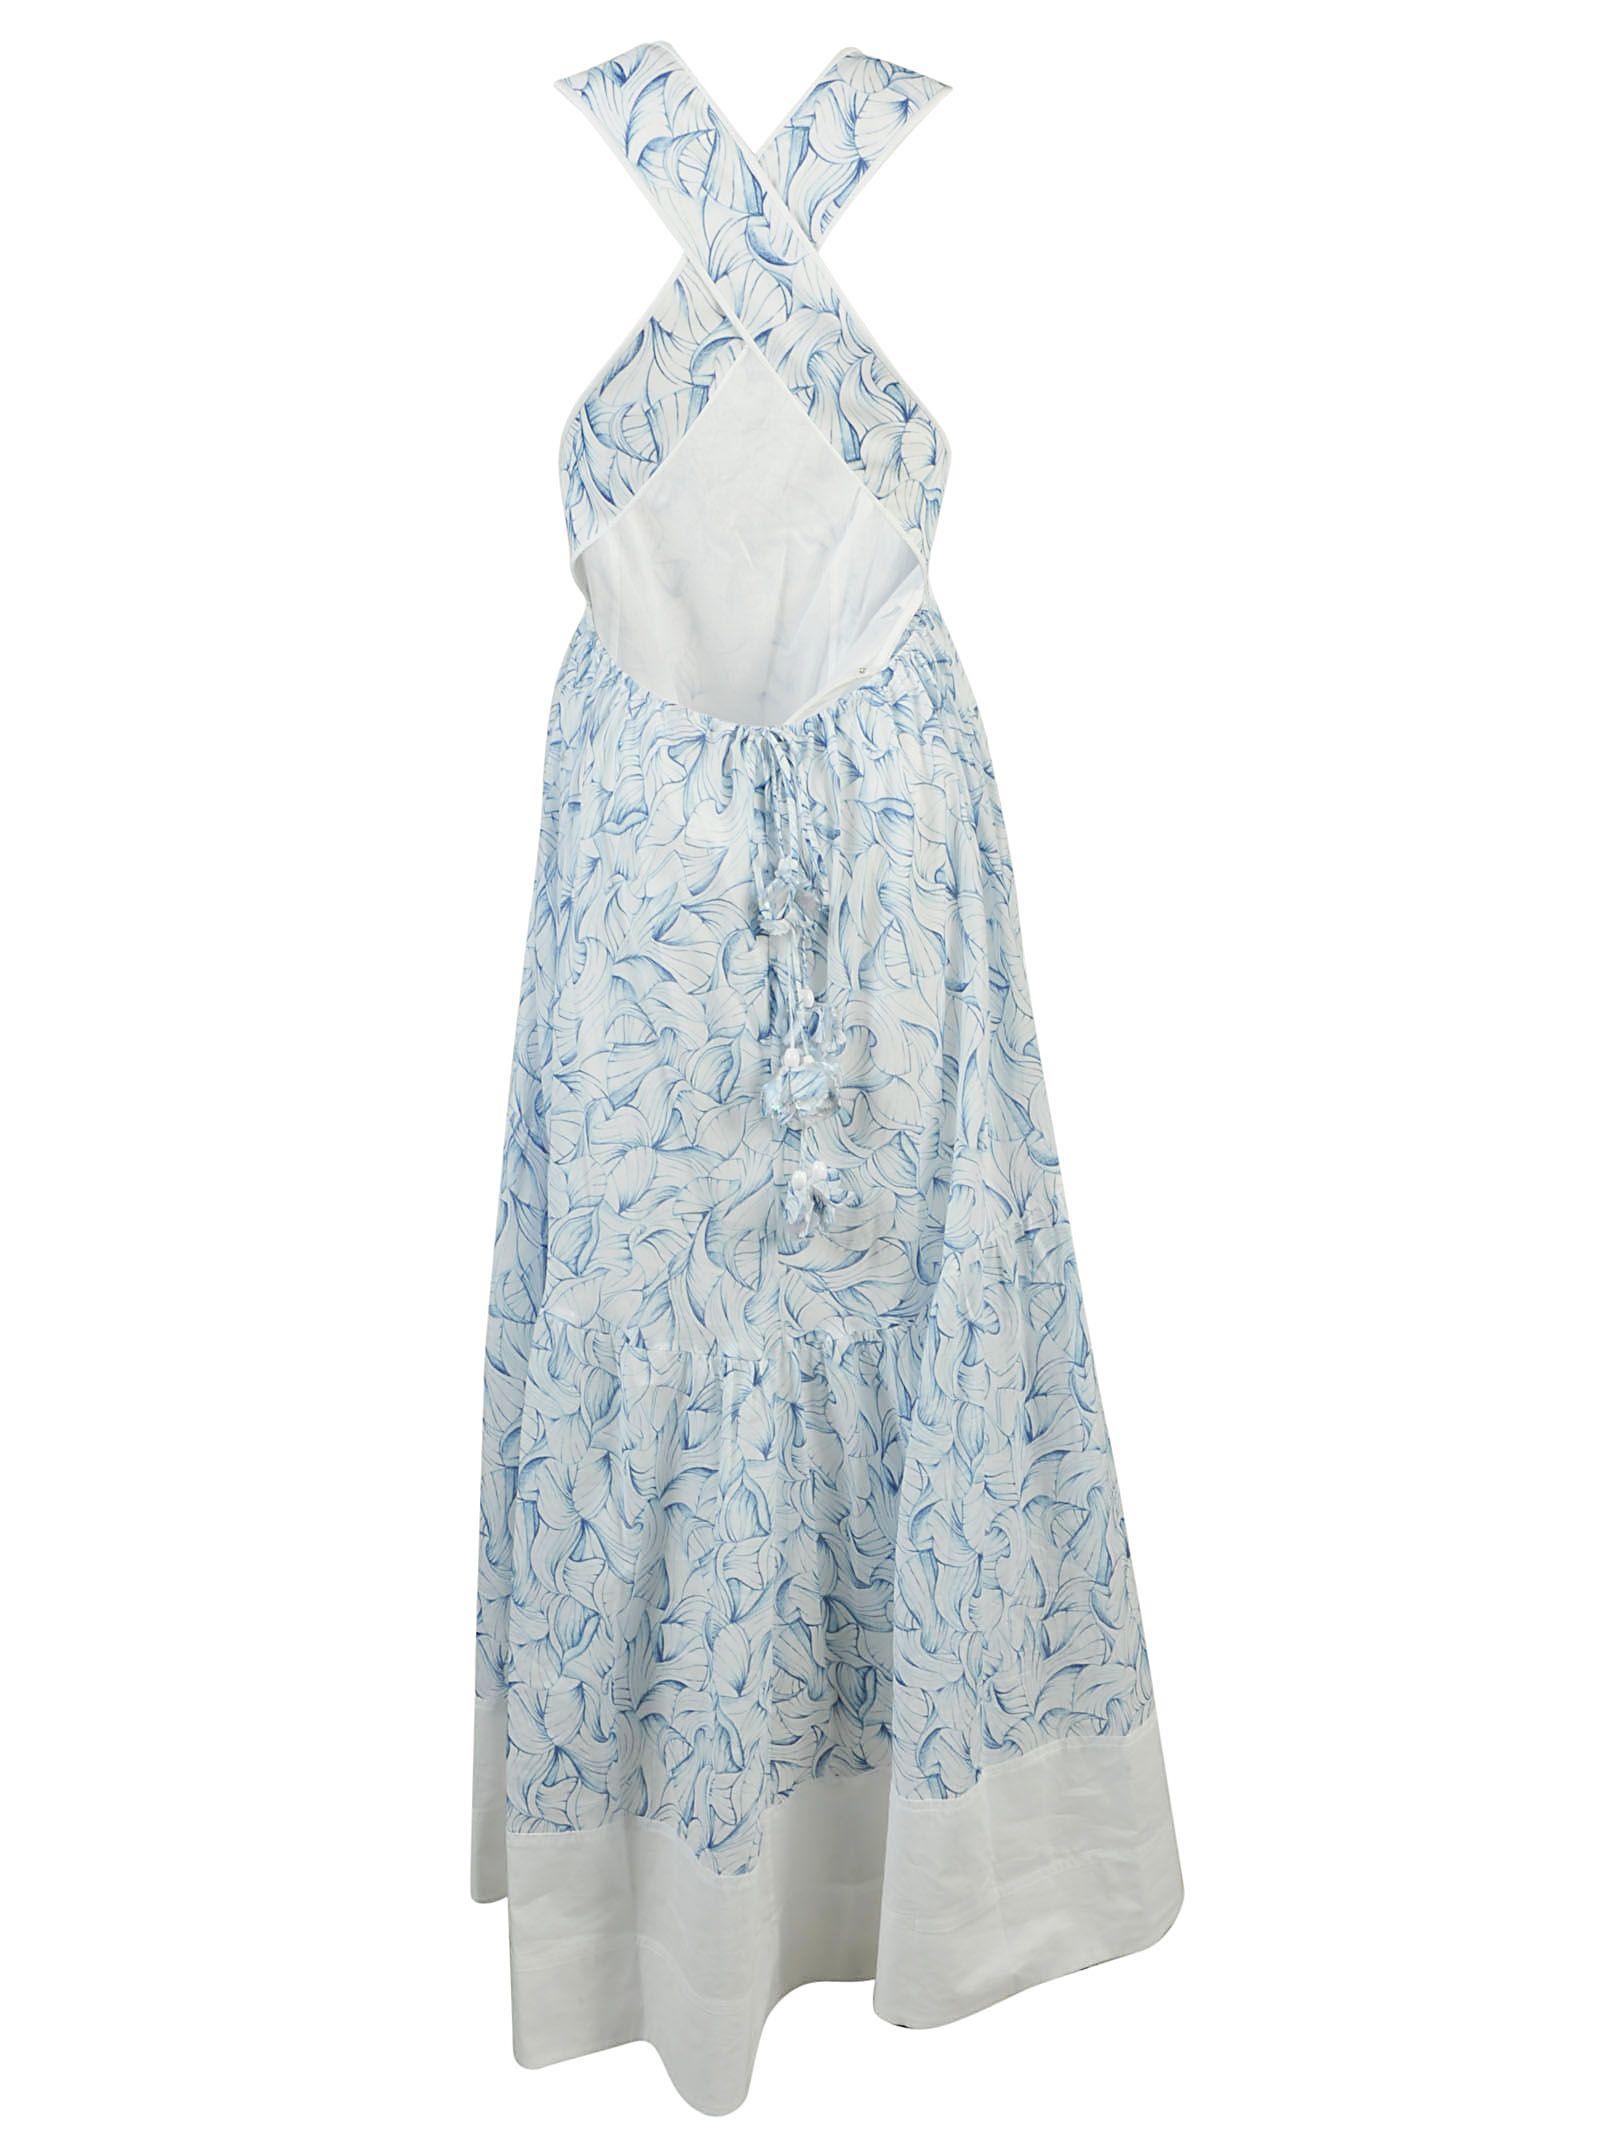 Tory Burch Tory Burch Blaire Dress White Women S Long Dresses